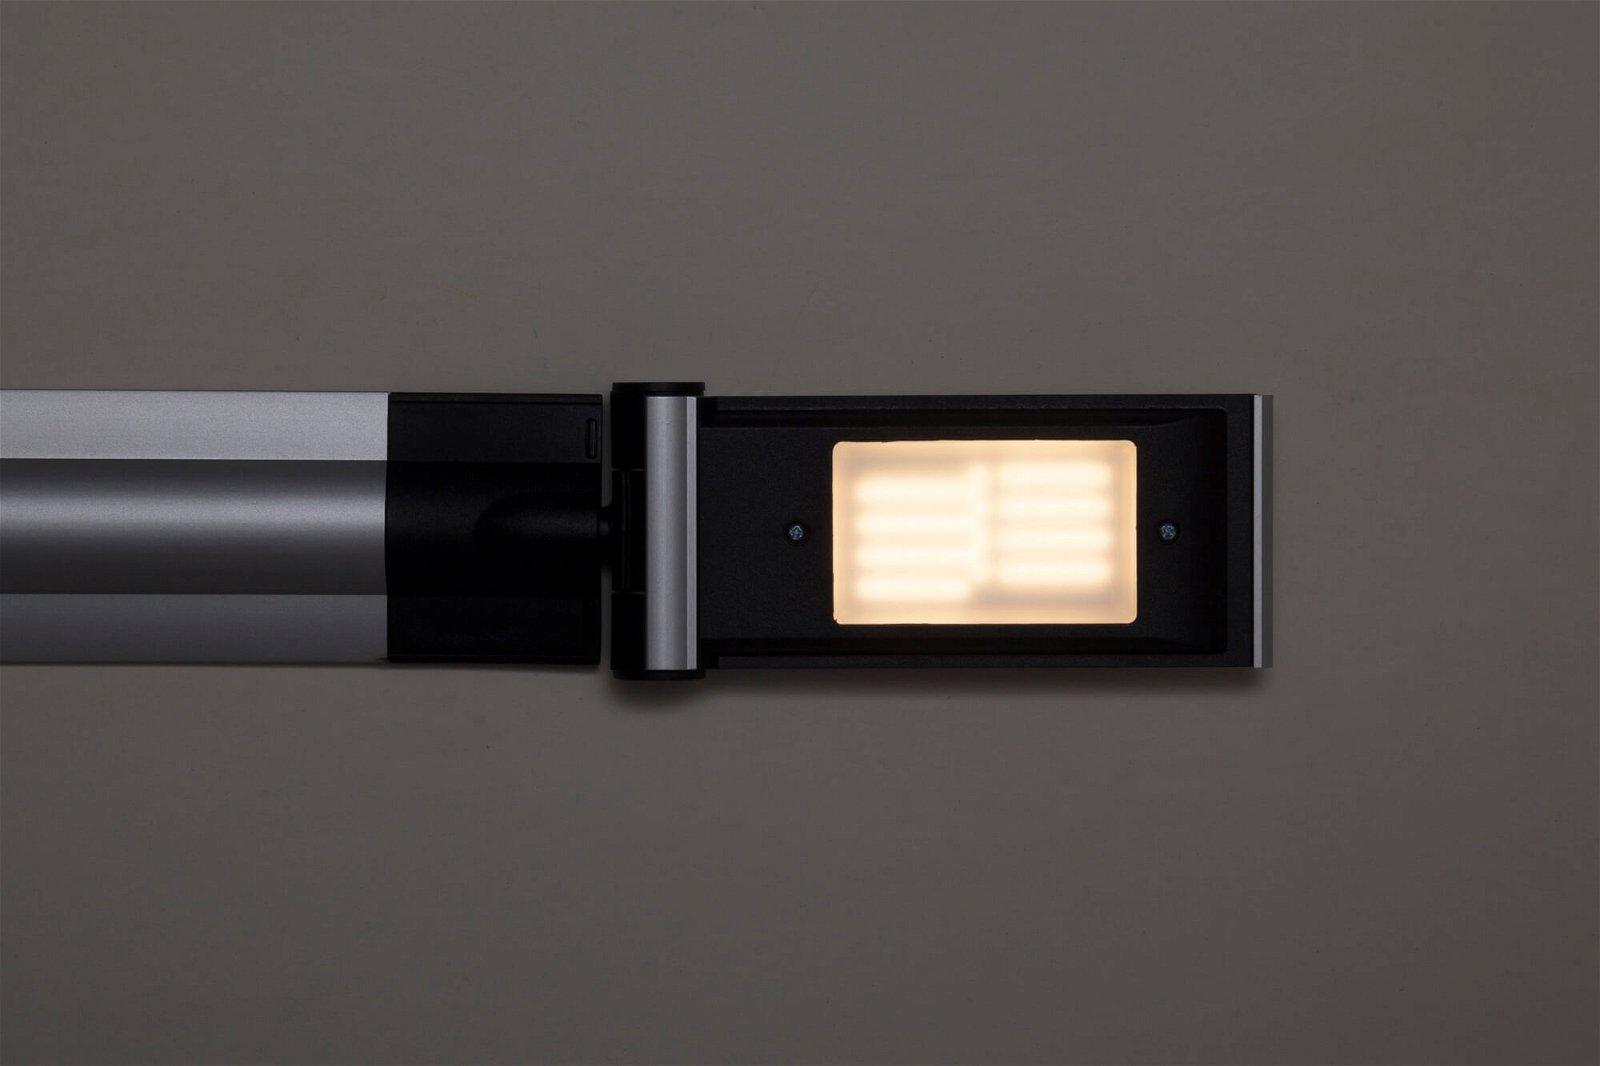 LED-Tischleuchte MAULoptimus, colour vario, dim., Standfuß, silber